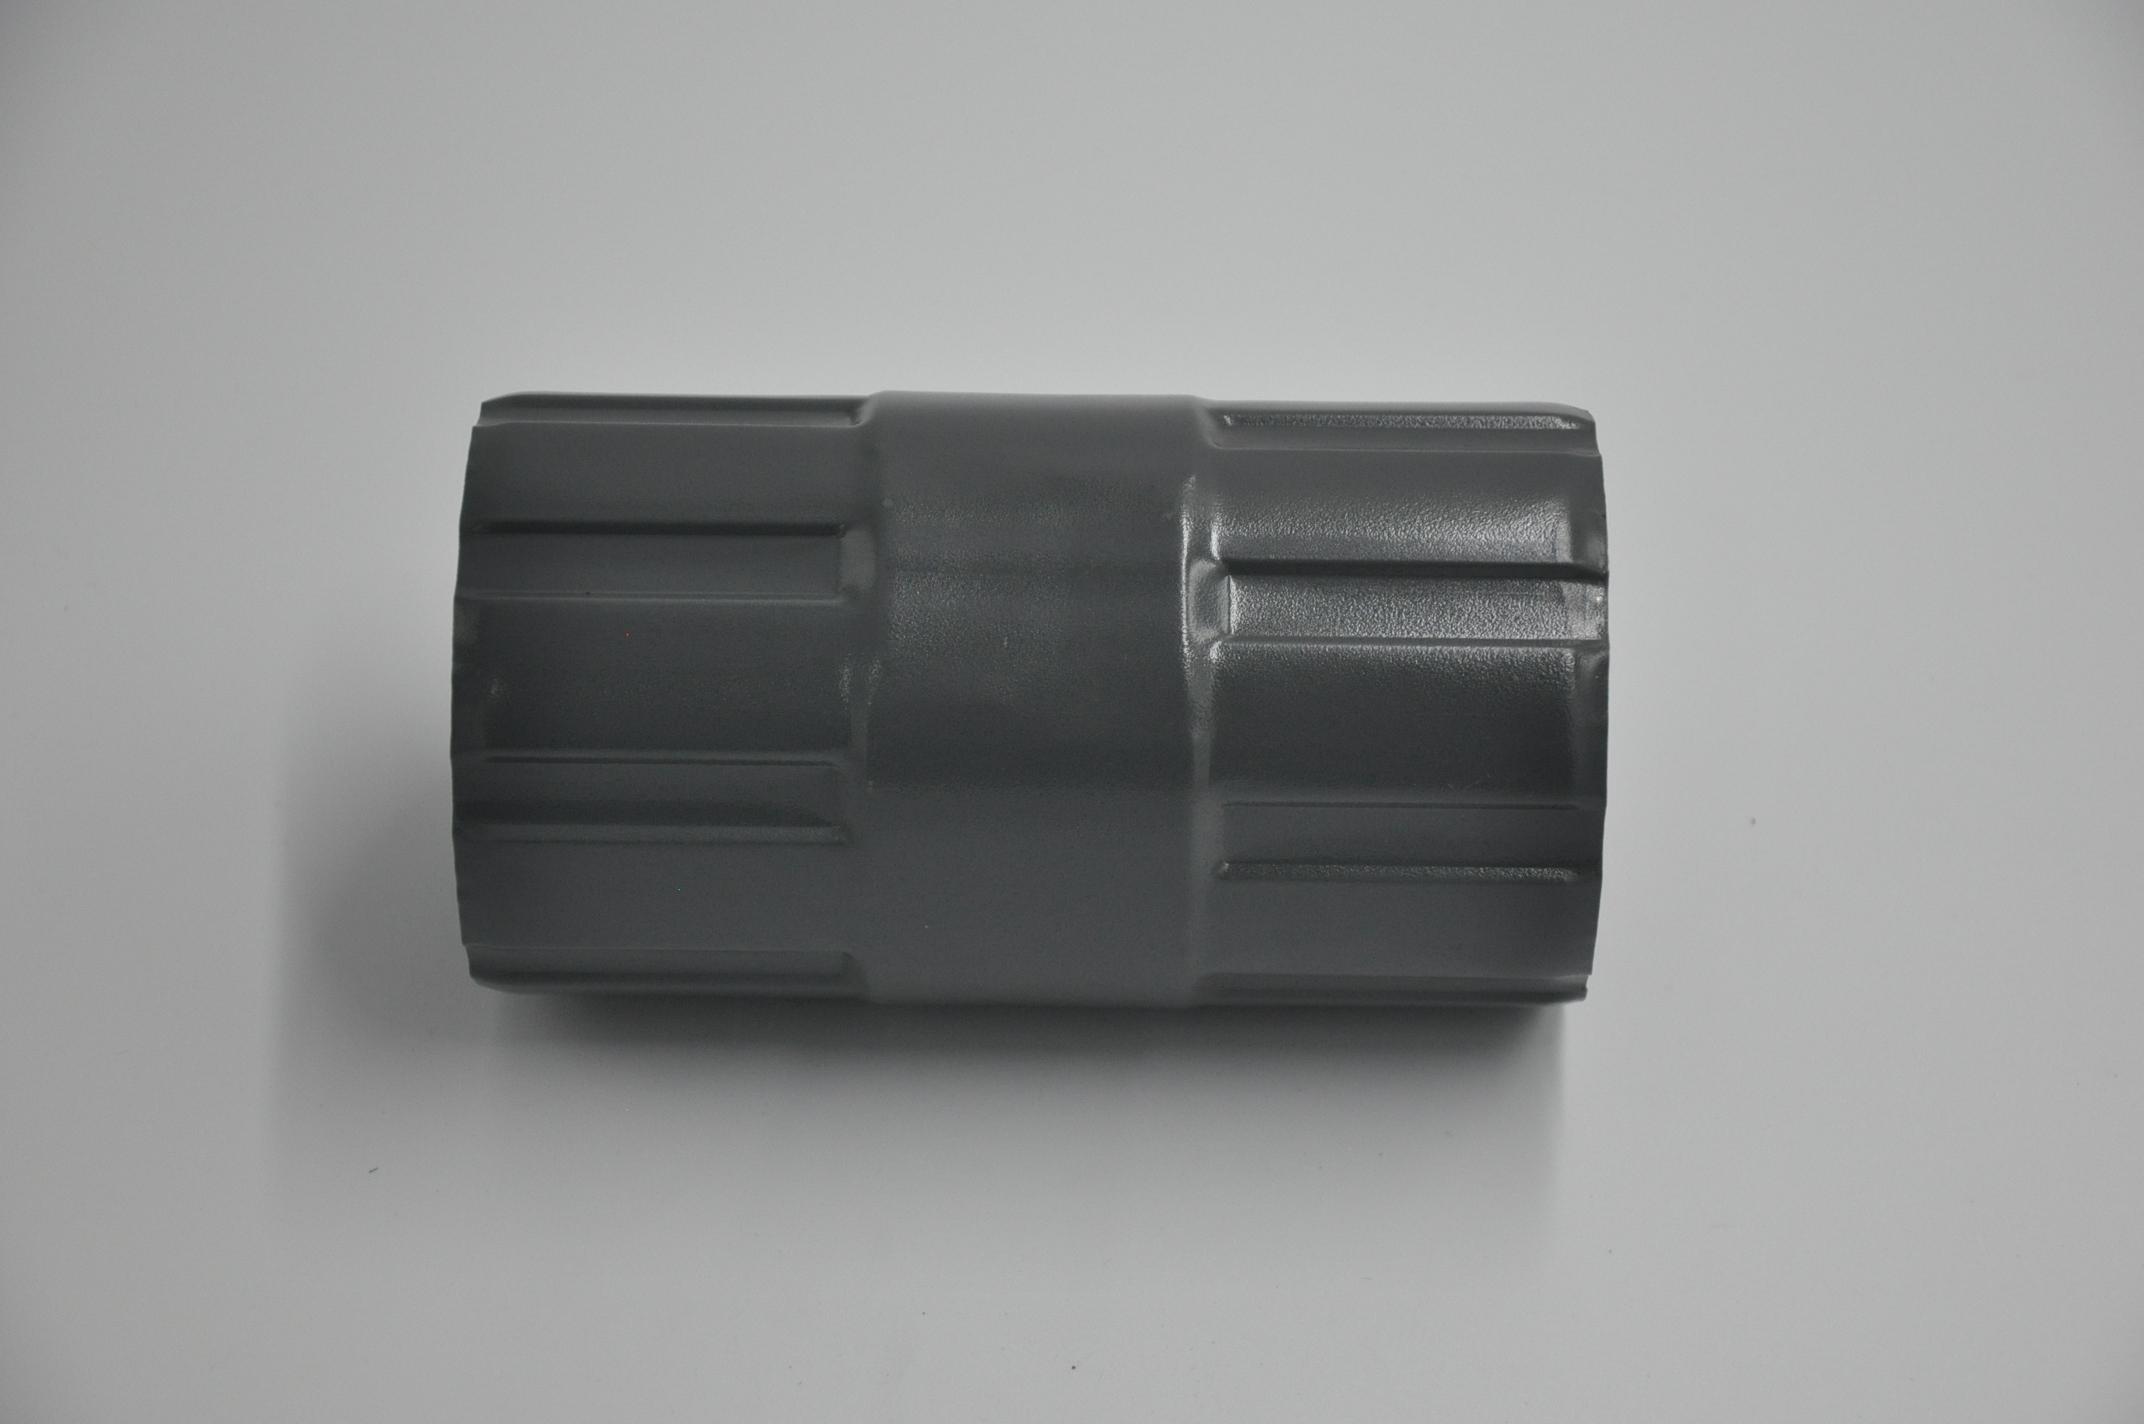 З'єднувач зливної труби, антрацит Aqueduct